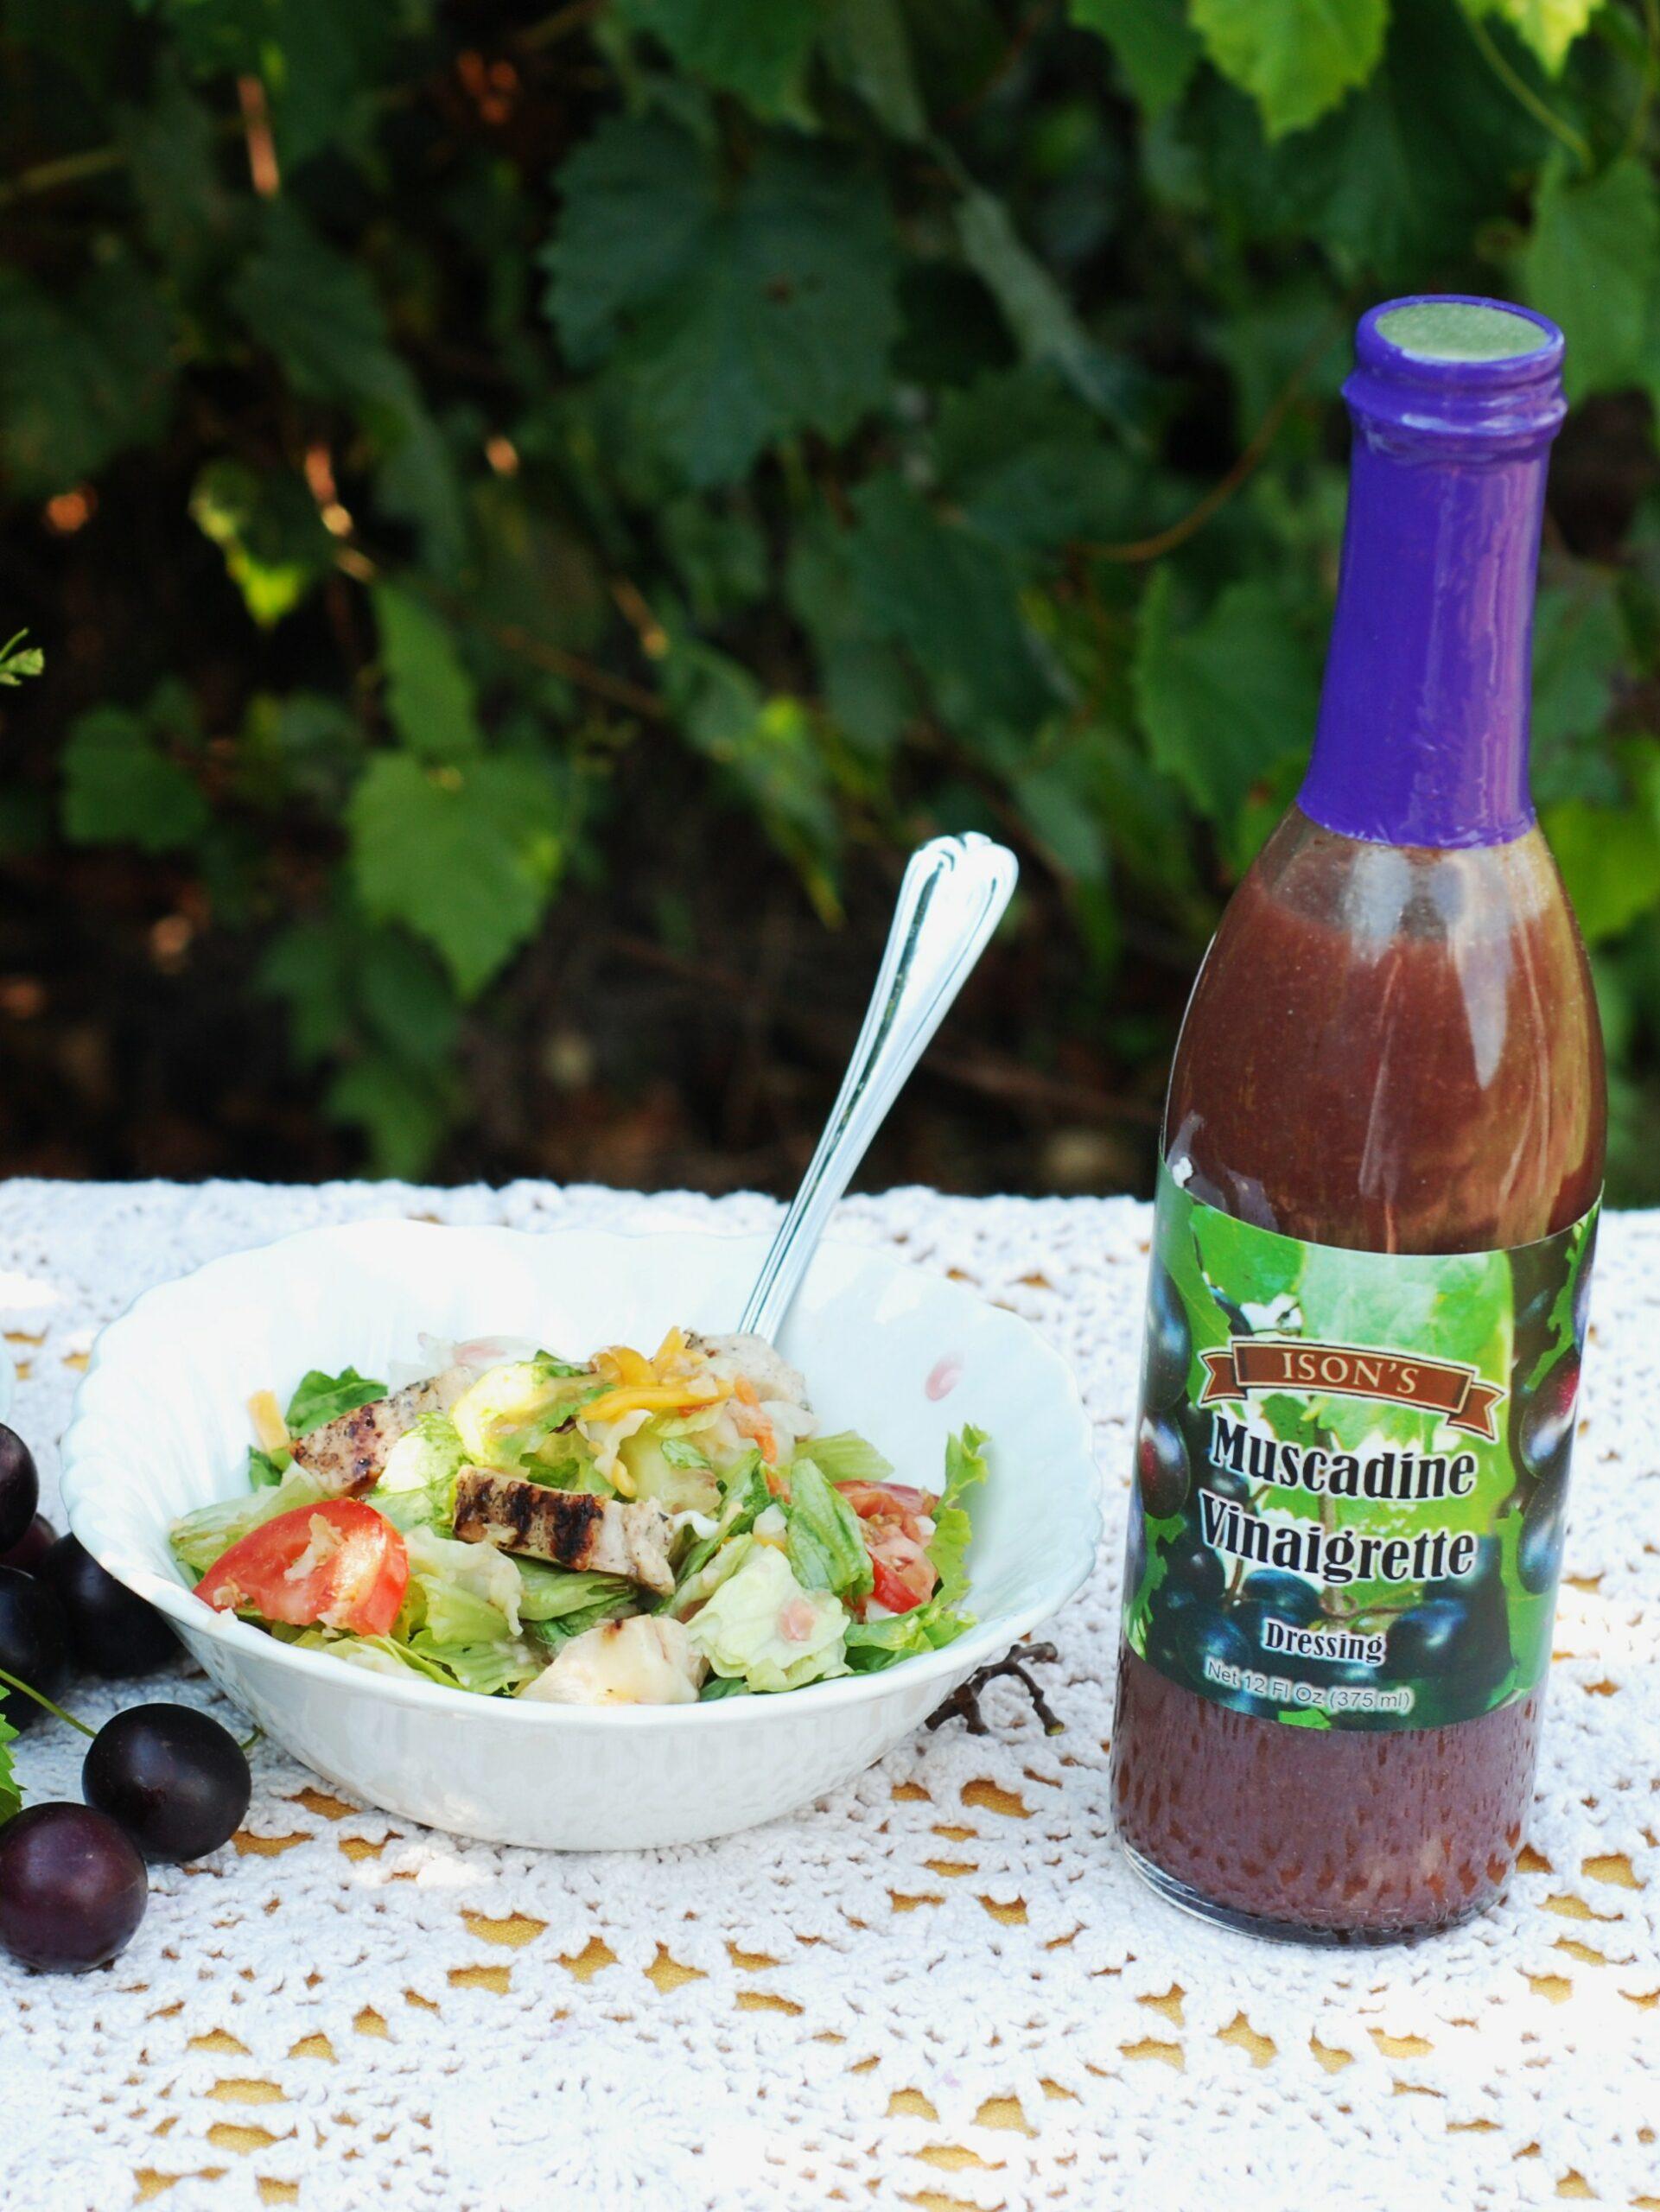 Muscadine Vinagrette. 12 oz. A delicious salad dressing.